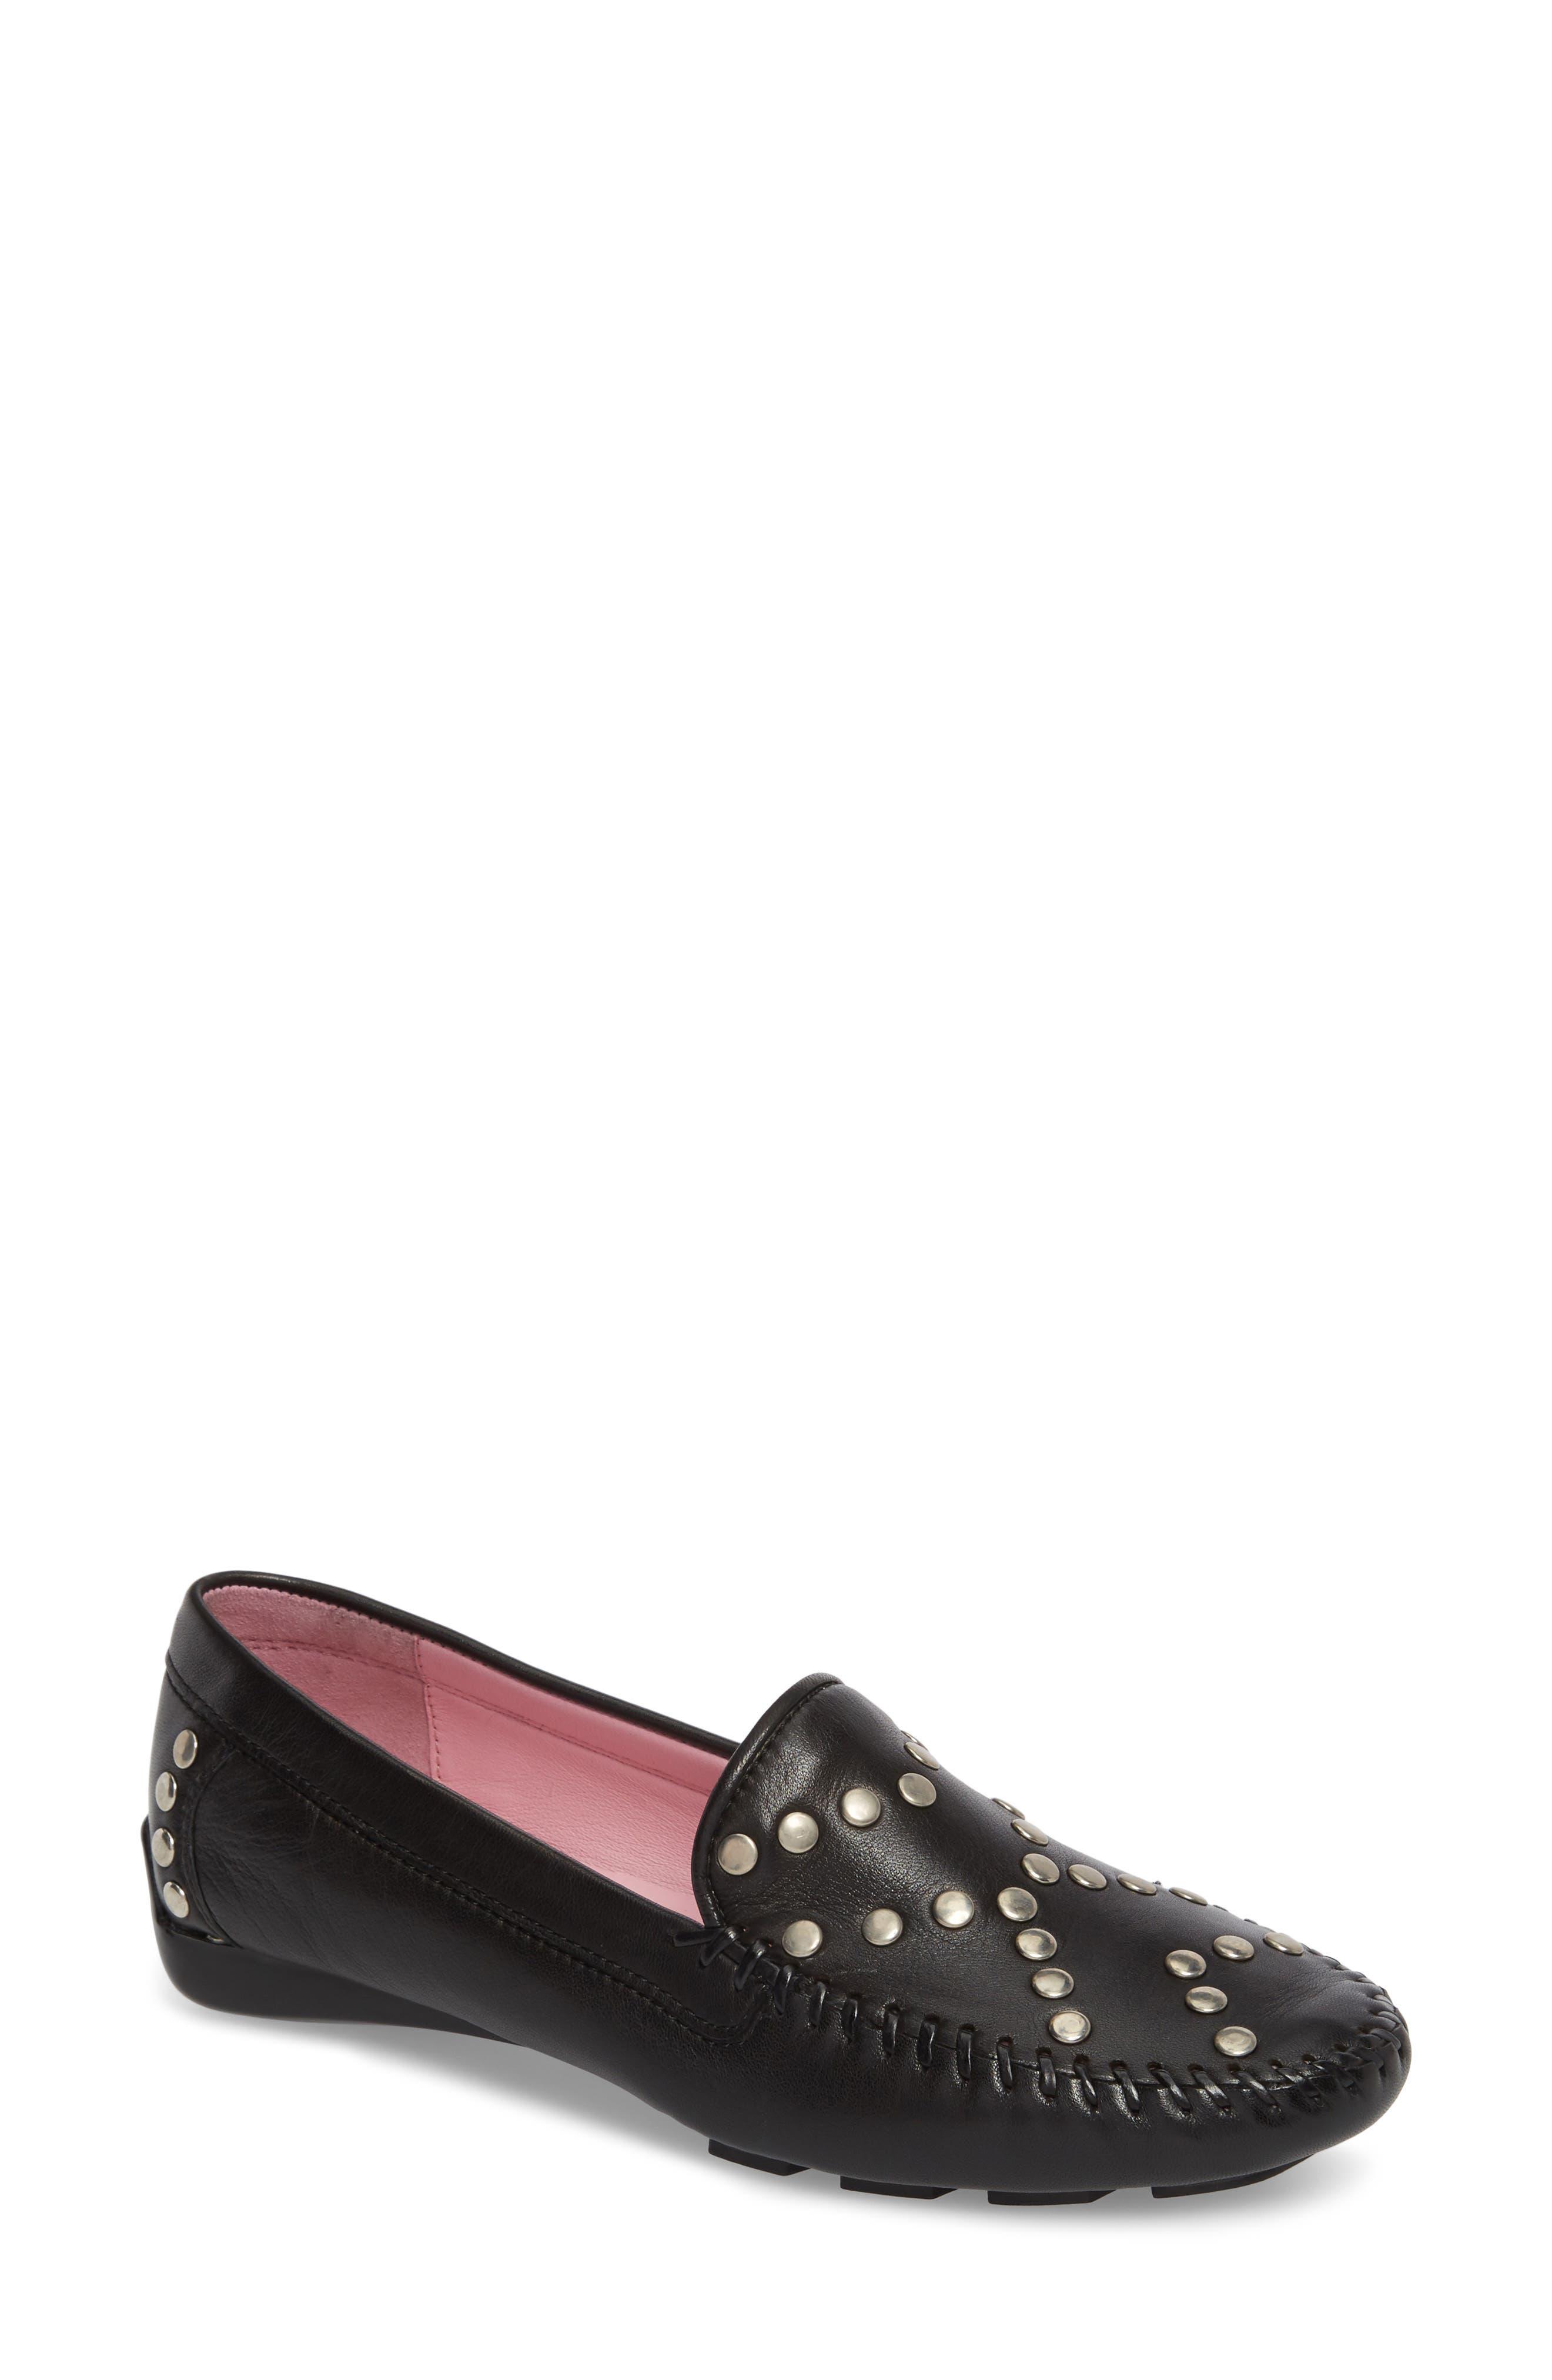 Tinae Studded Loafer,                         Main,                         color, Black Leather